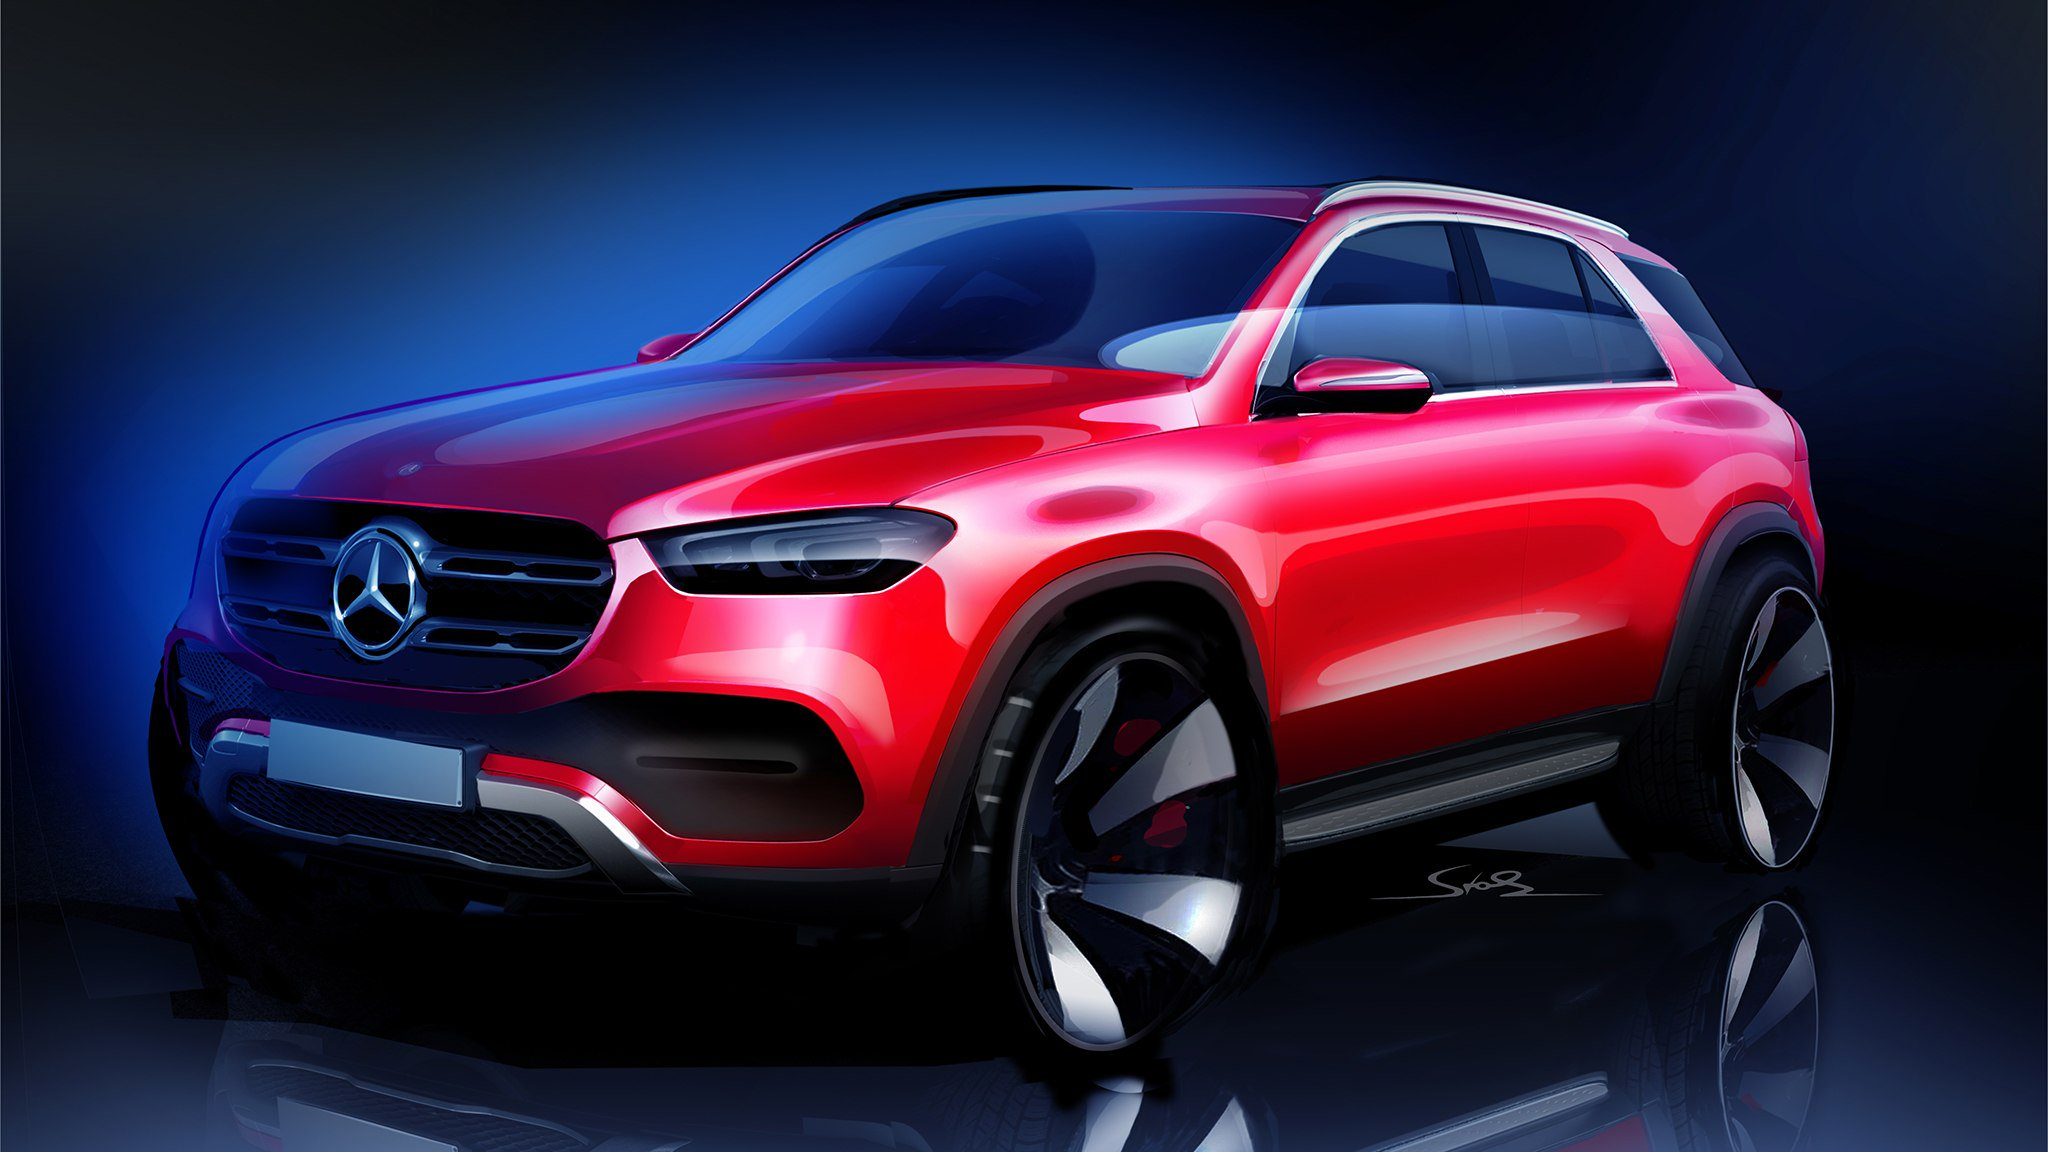 2020 Mercedes-Benz GLE Concept